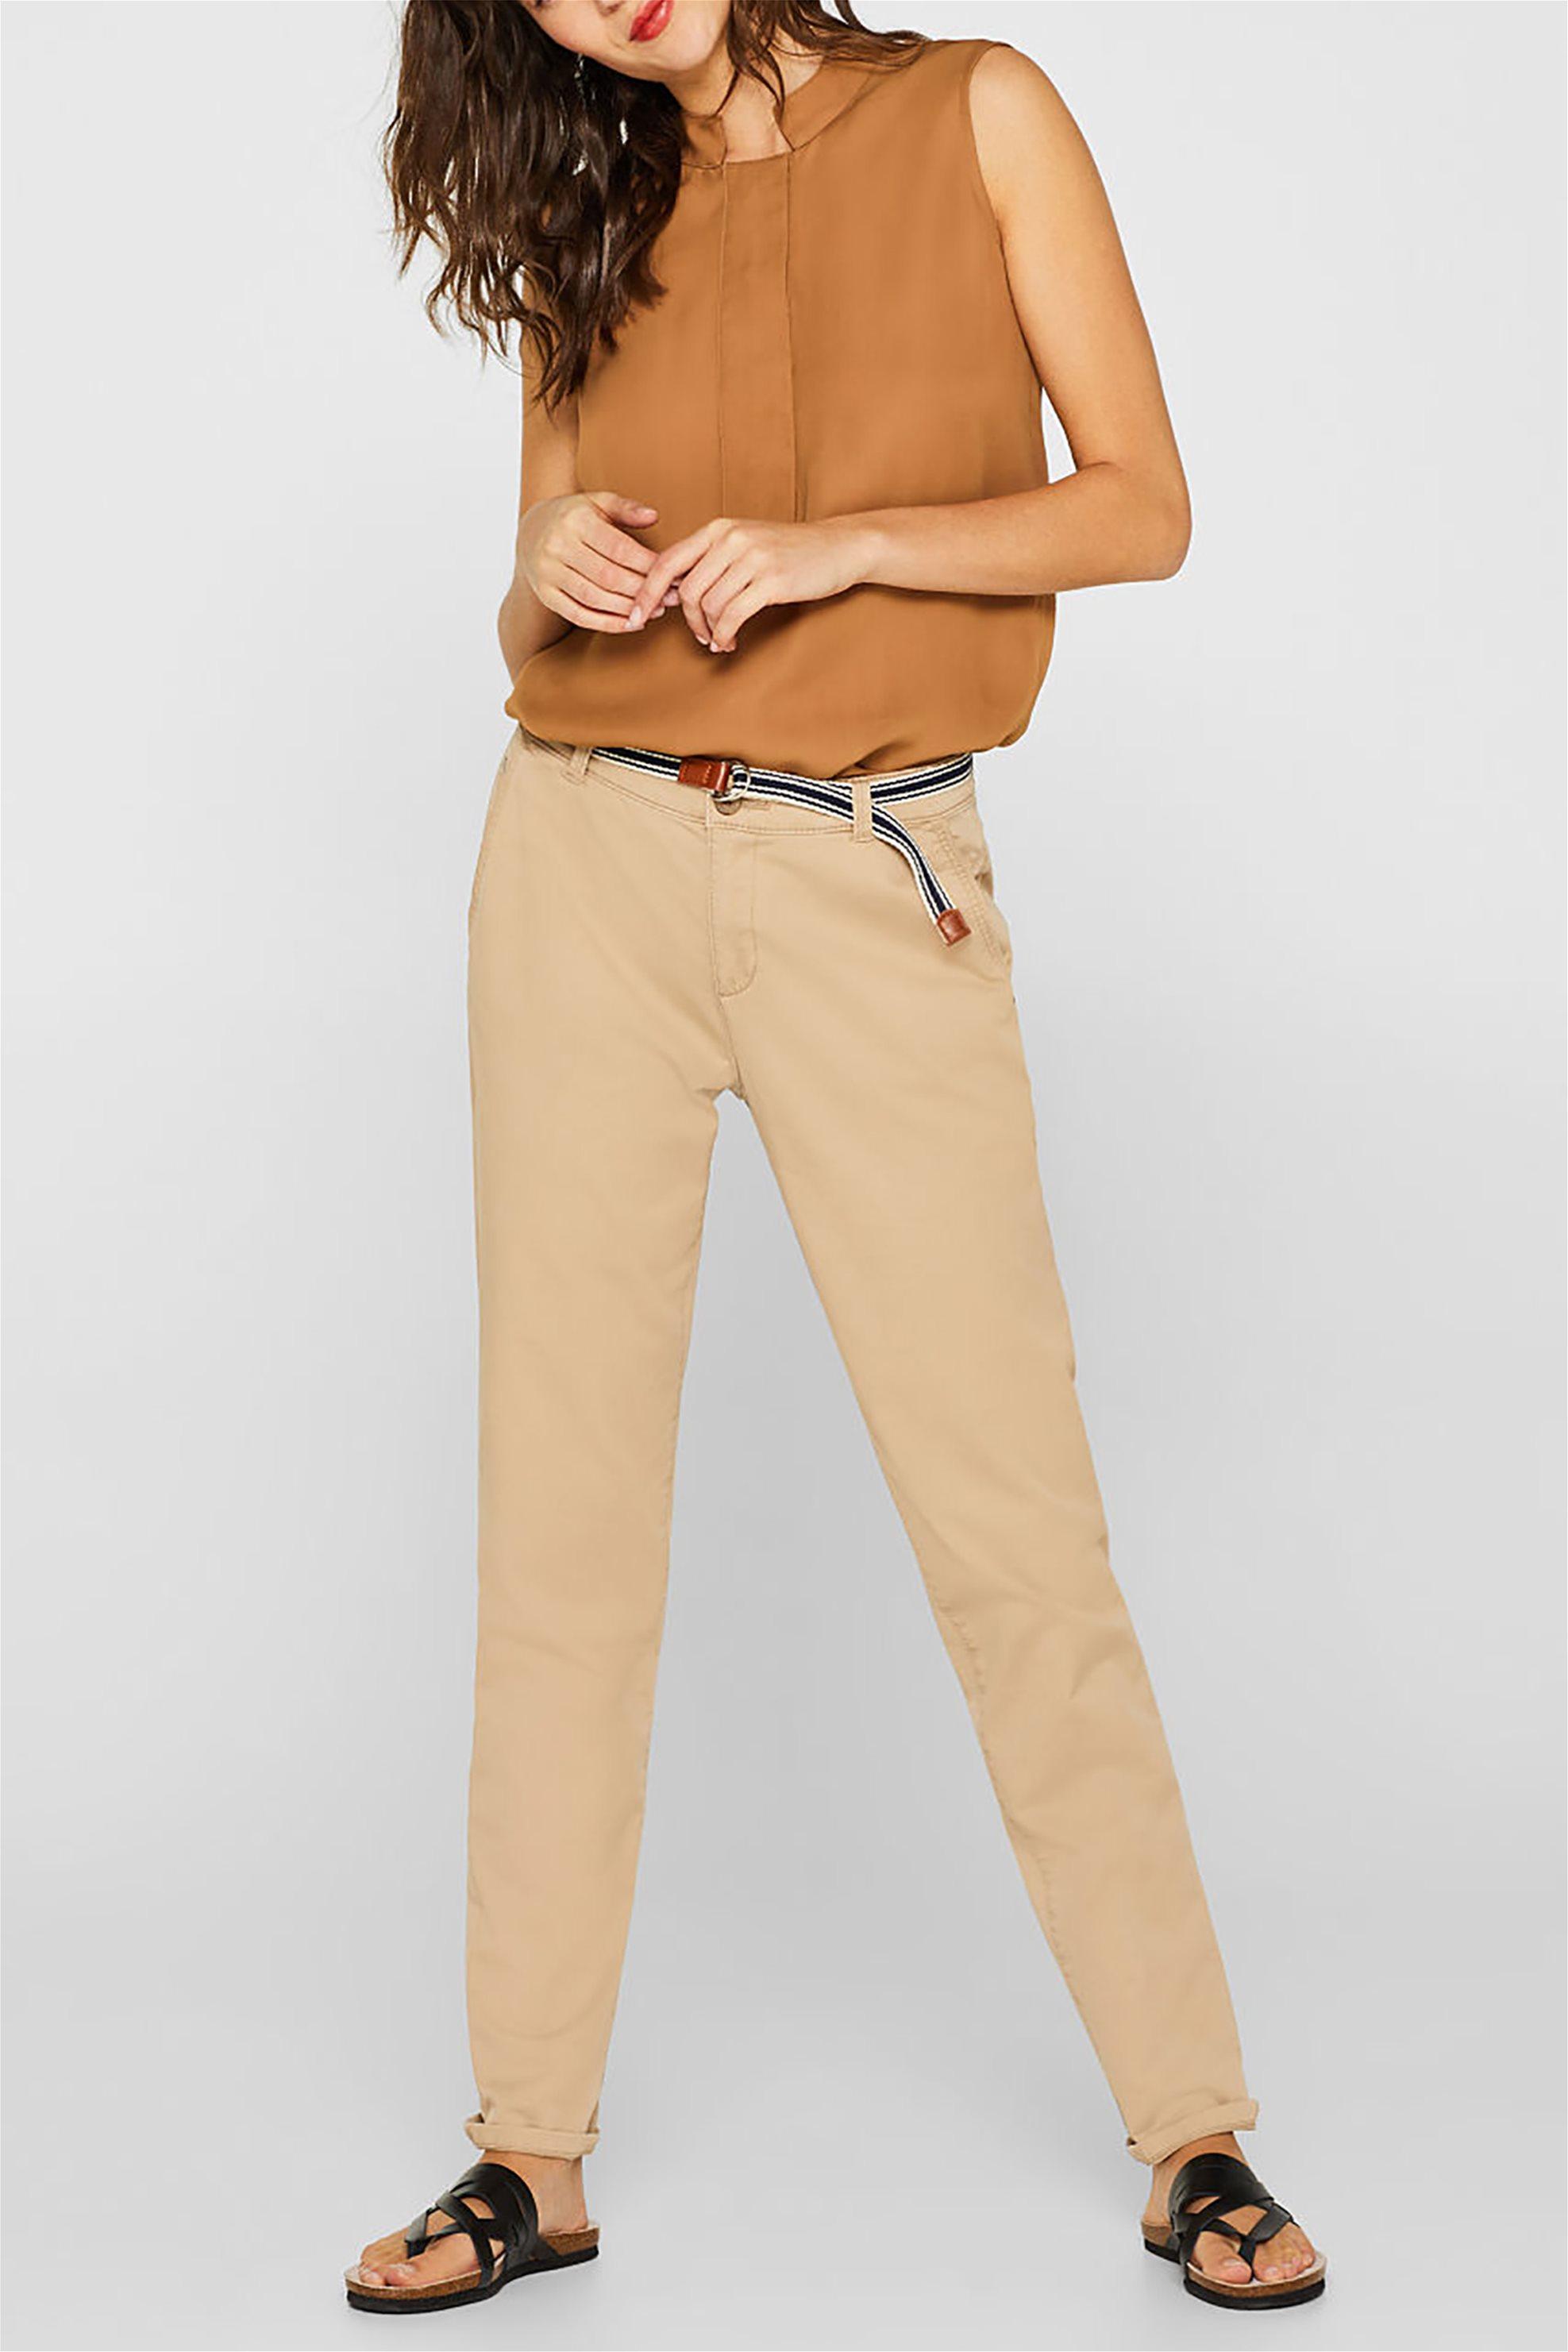 51d73ddc5ab0 Esprit γυναικείο chinos παντελόνι με ριγέ ζώνη - 999EE1B800 - Μπεζ